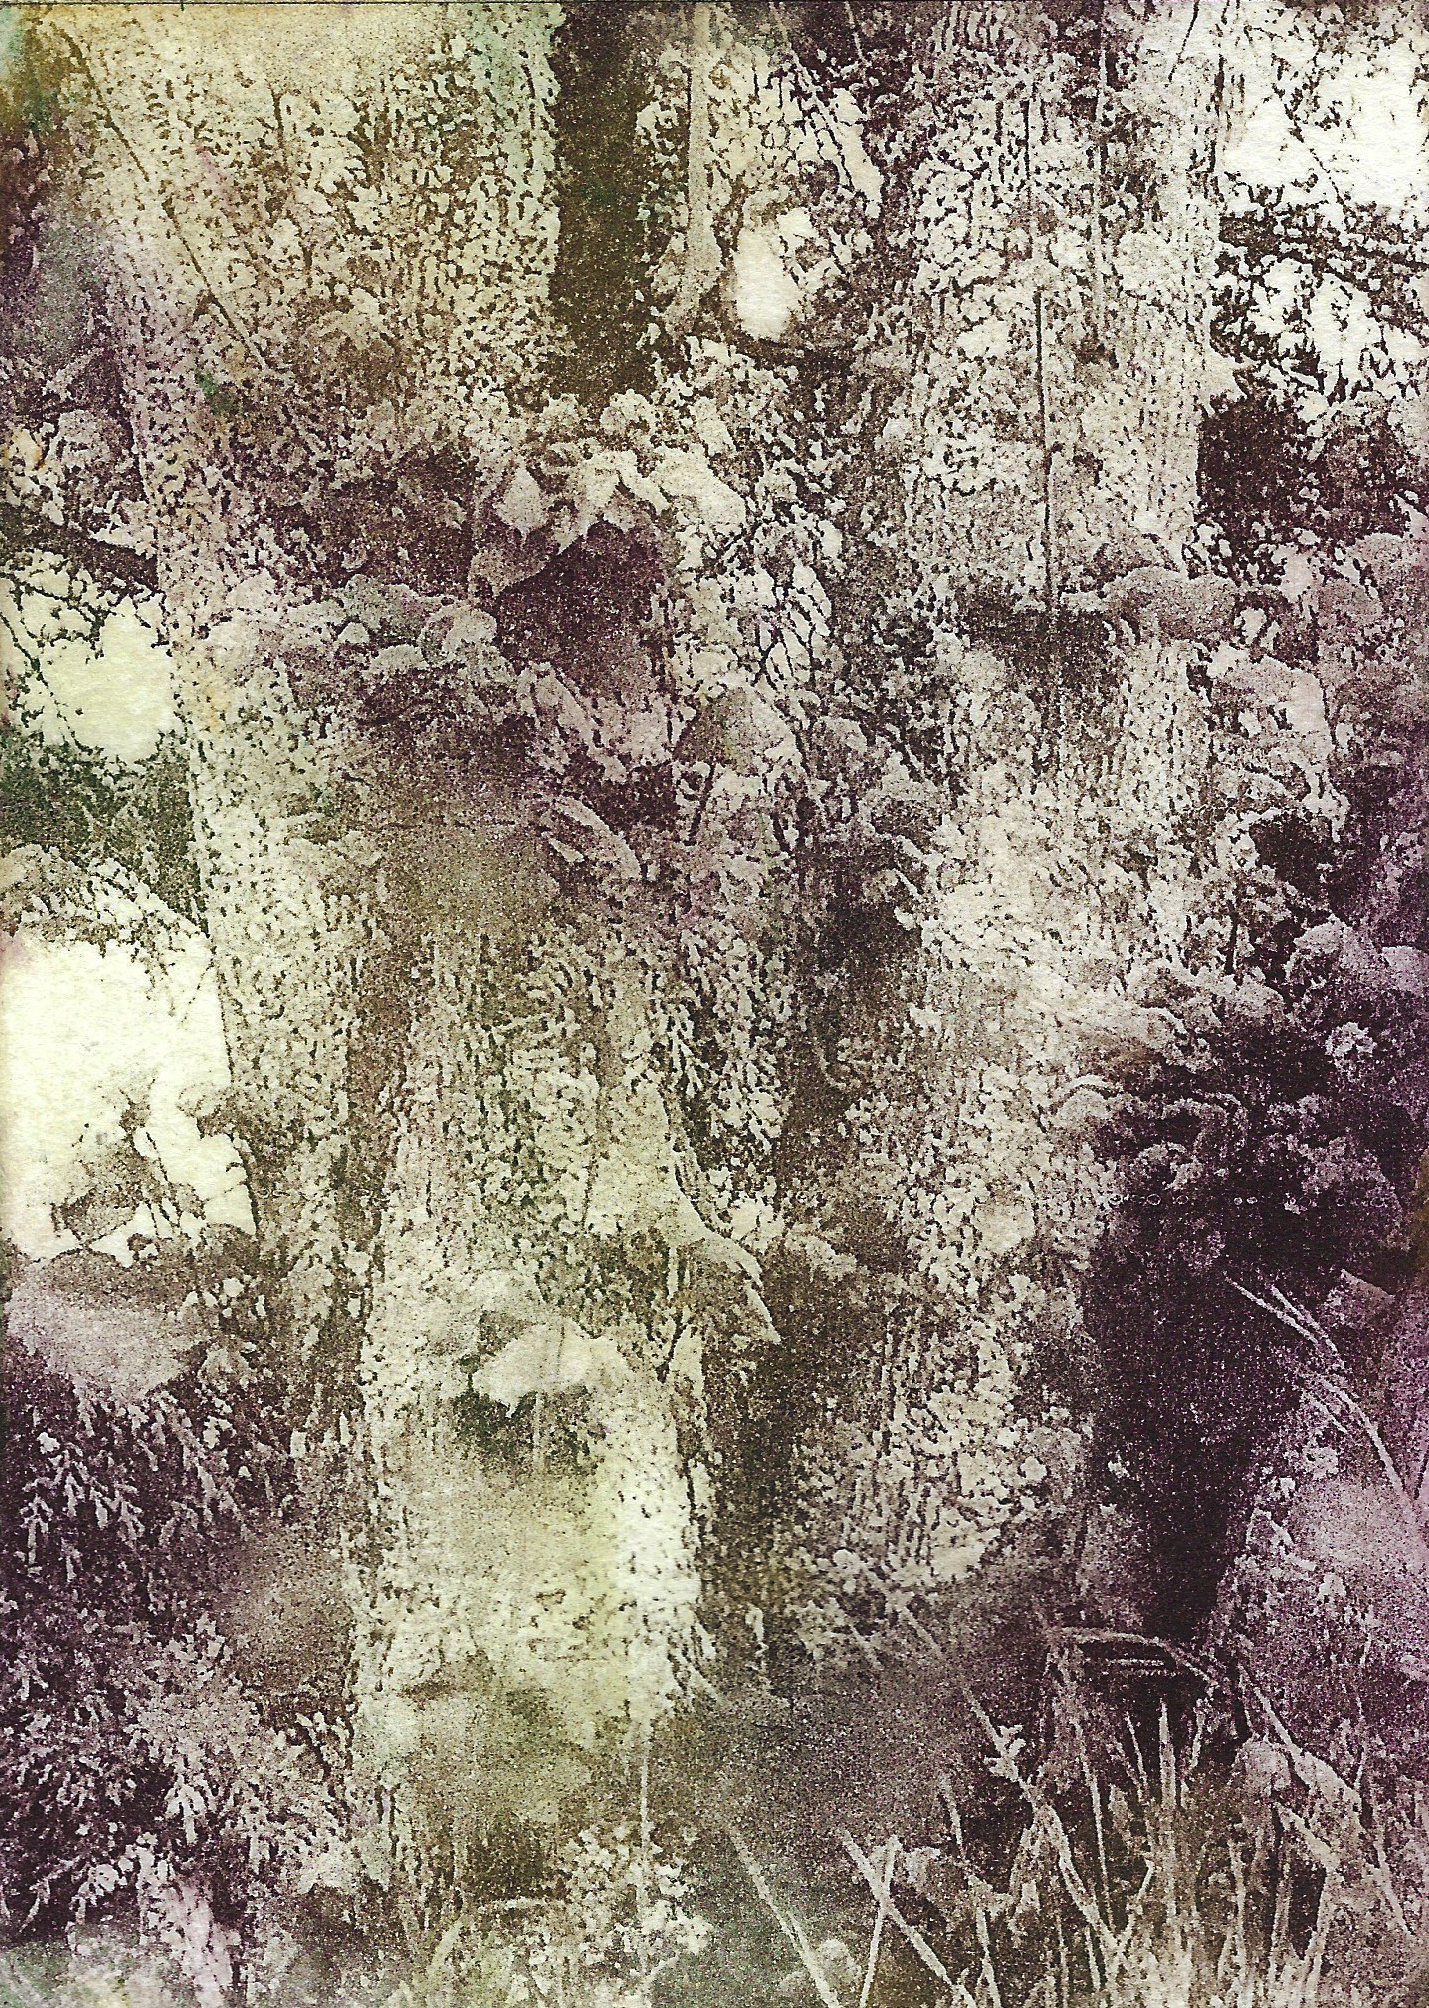 Flora_moss and brown.jpg